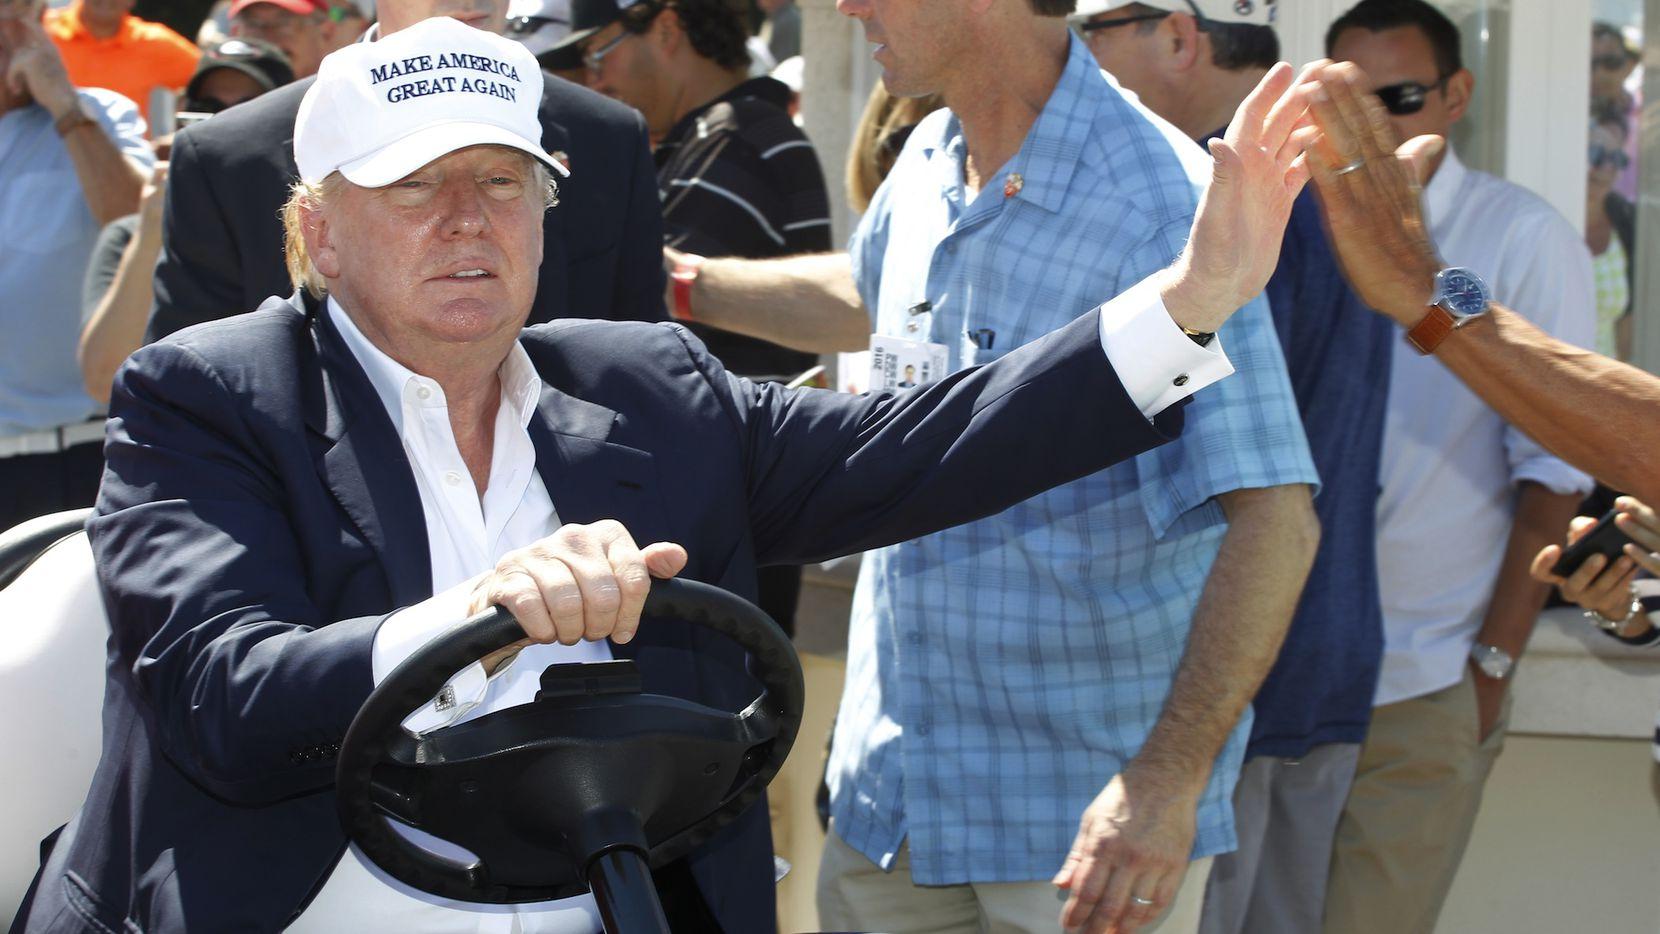 Donald Trump maneja un carro de golf en su campo de golf Mar-a-Lago en Doral, Florida.